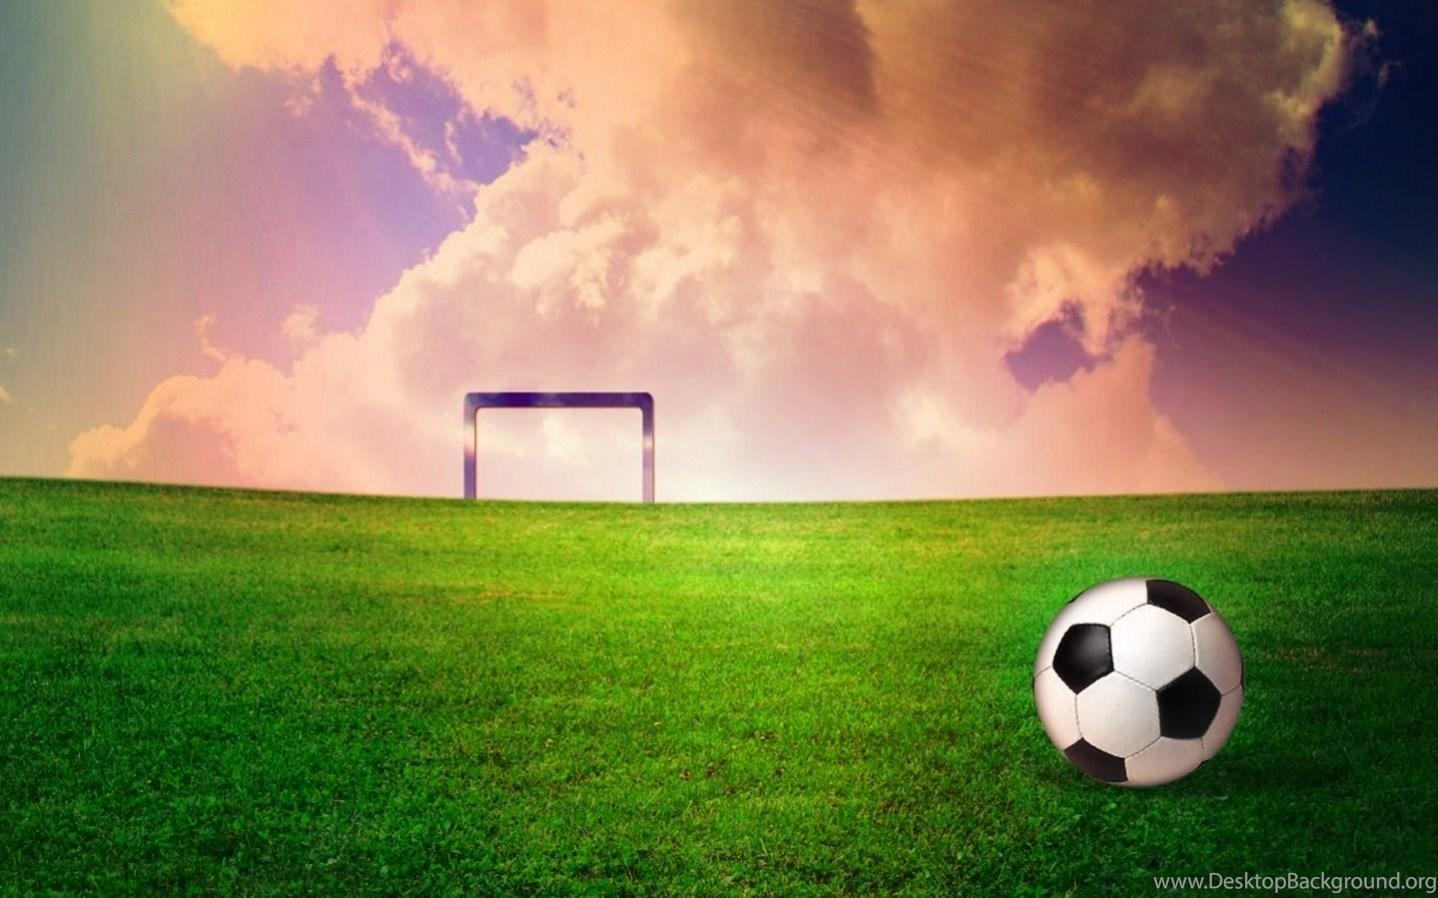 desktop backgrounds fantasy football stadium hd photos free desktop background desktop backgrounds fantasy football